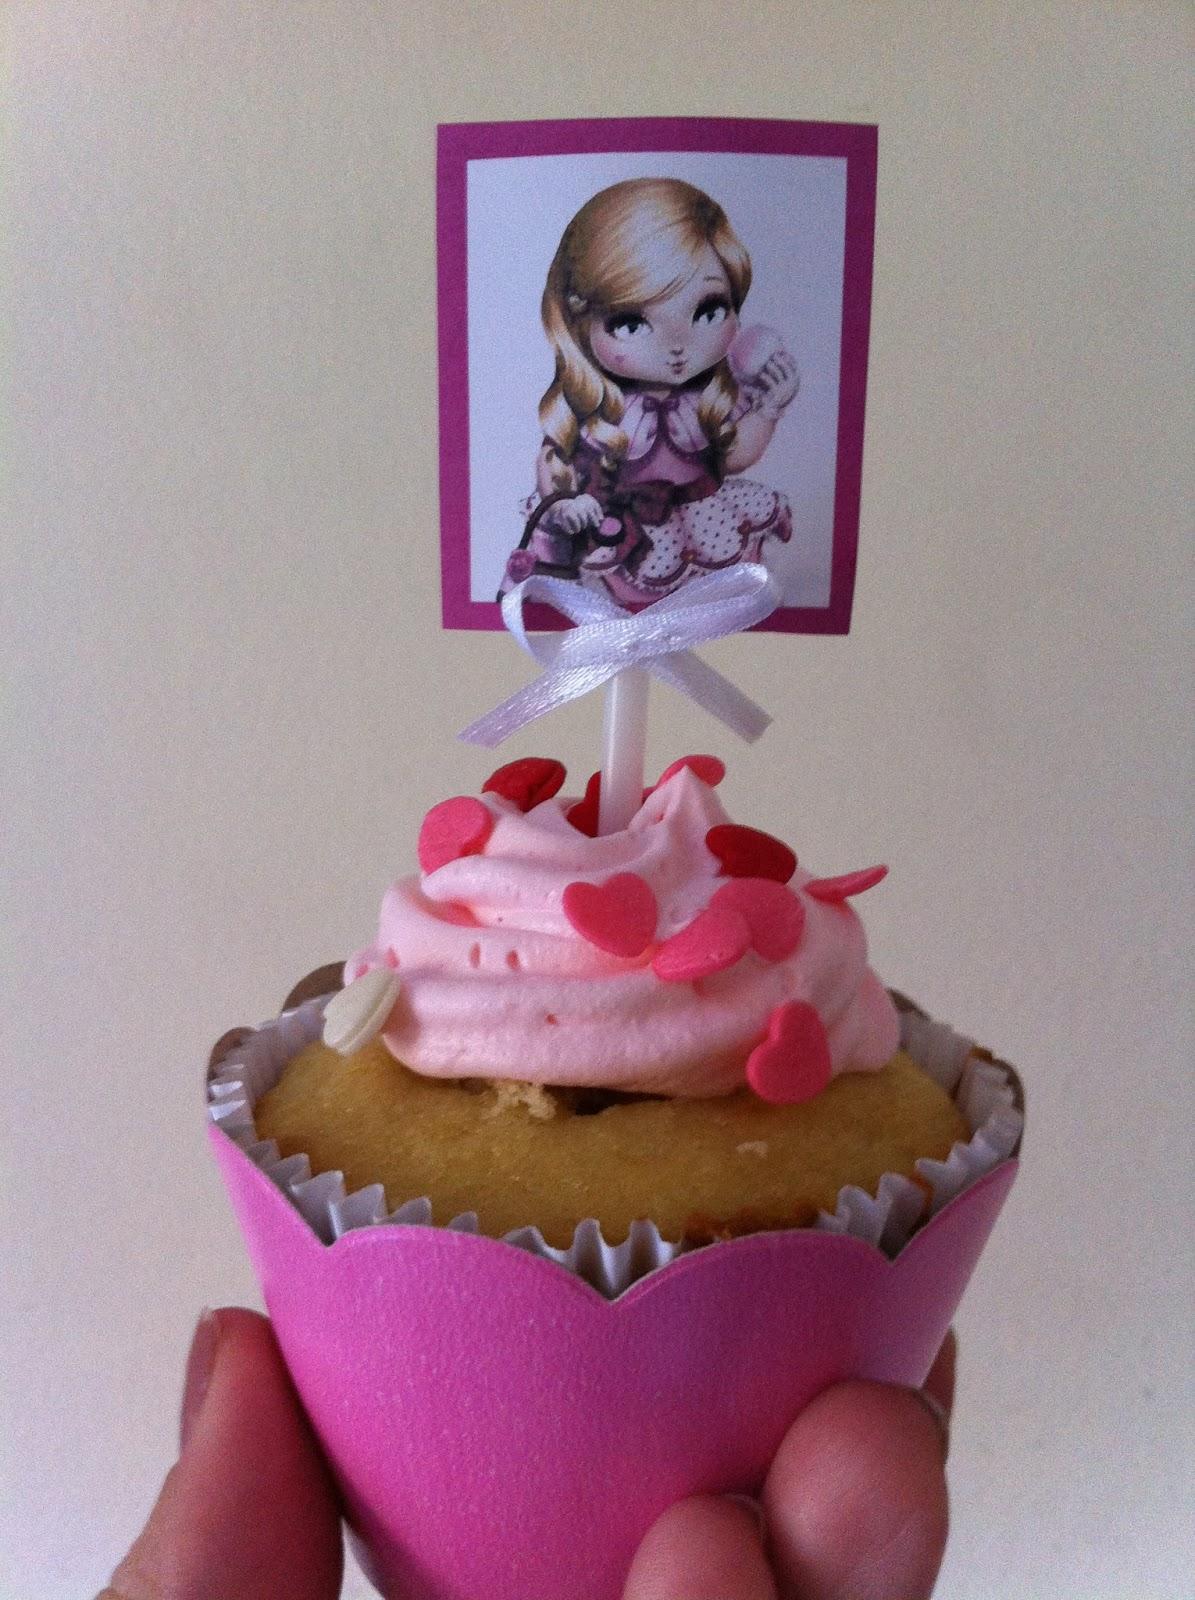 Cupcakebh blog cupcakes jolie - Jolie cupcake ...